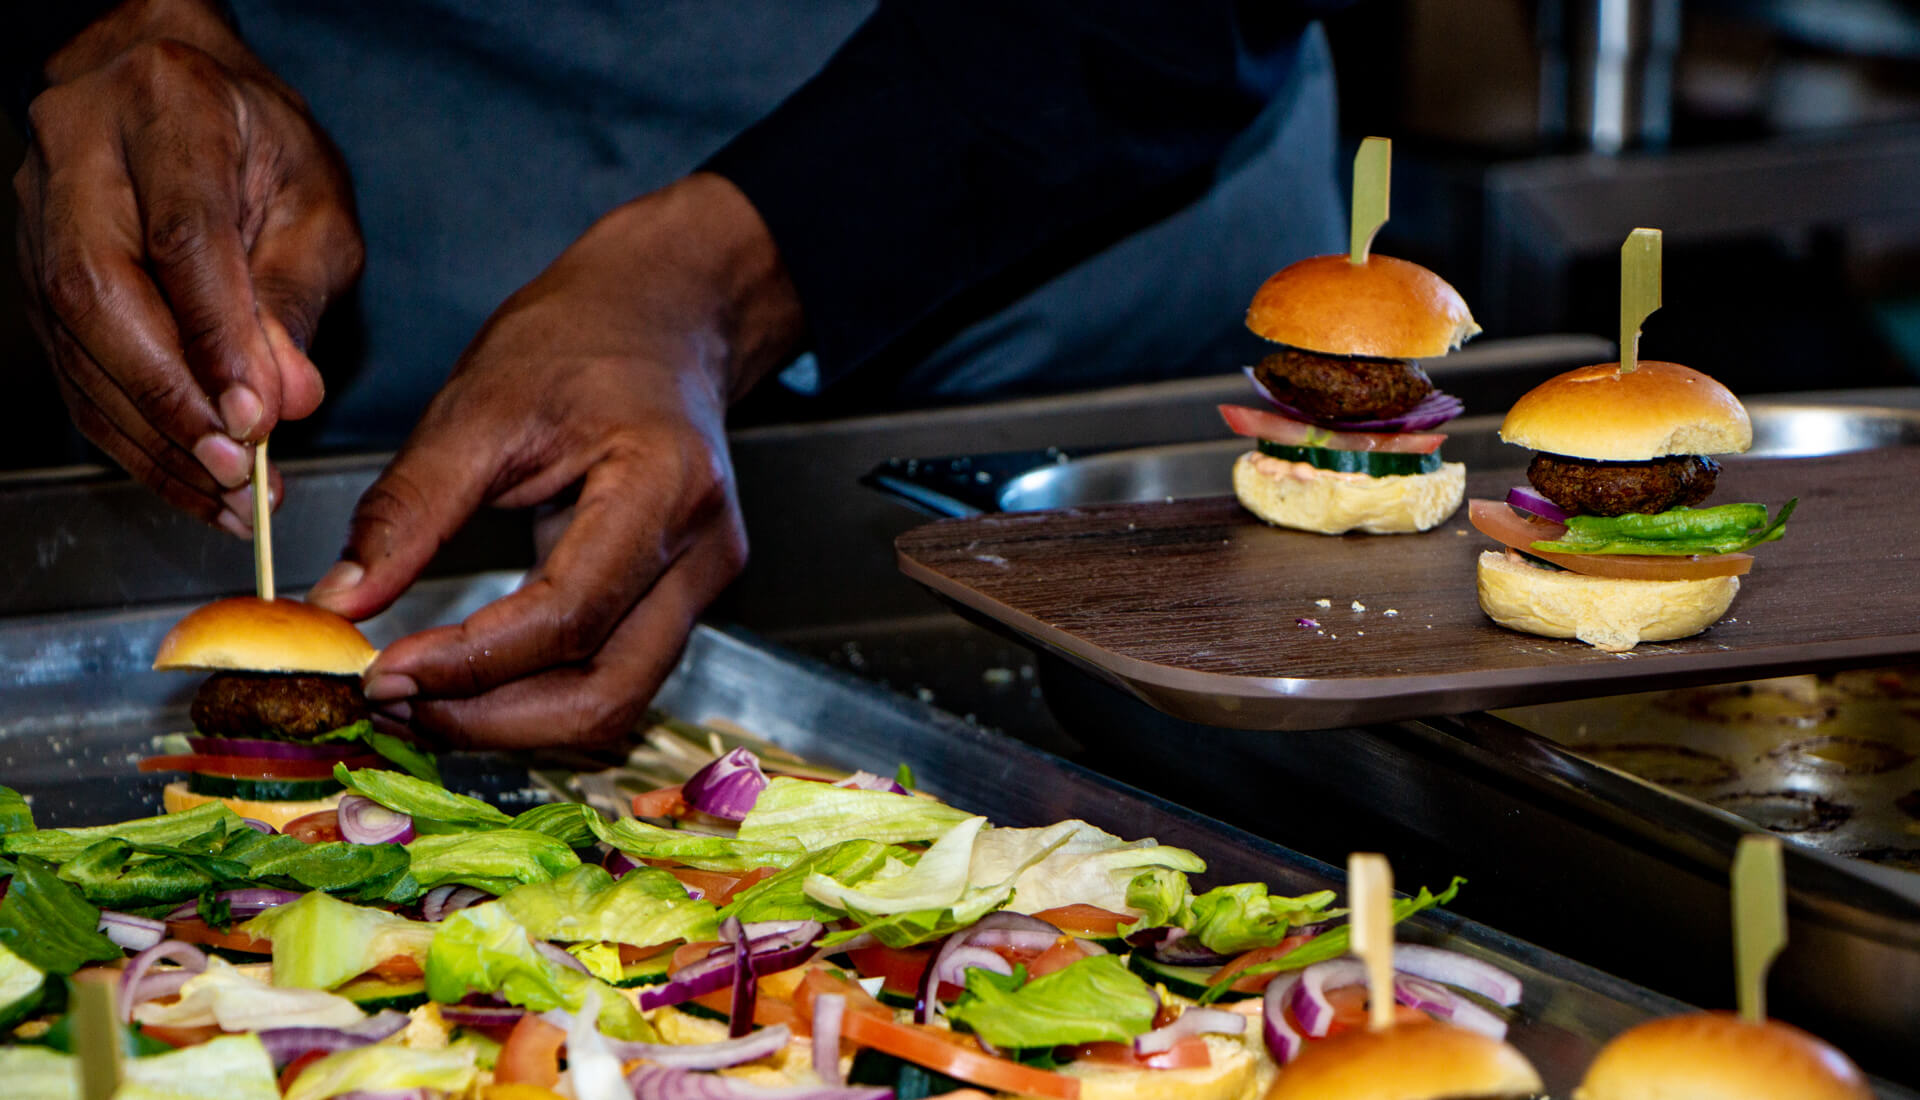 Food and drink photographer birmingham uk, food preparation, mini burgers being prepared